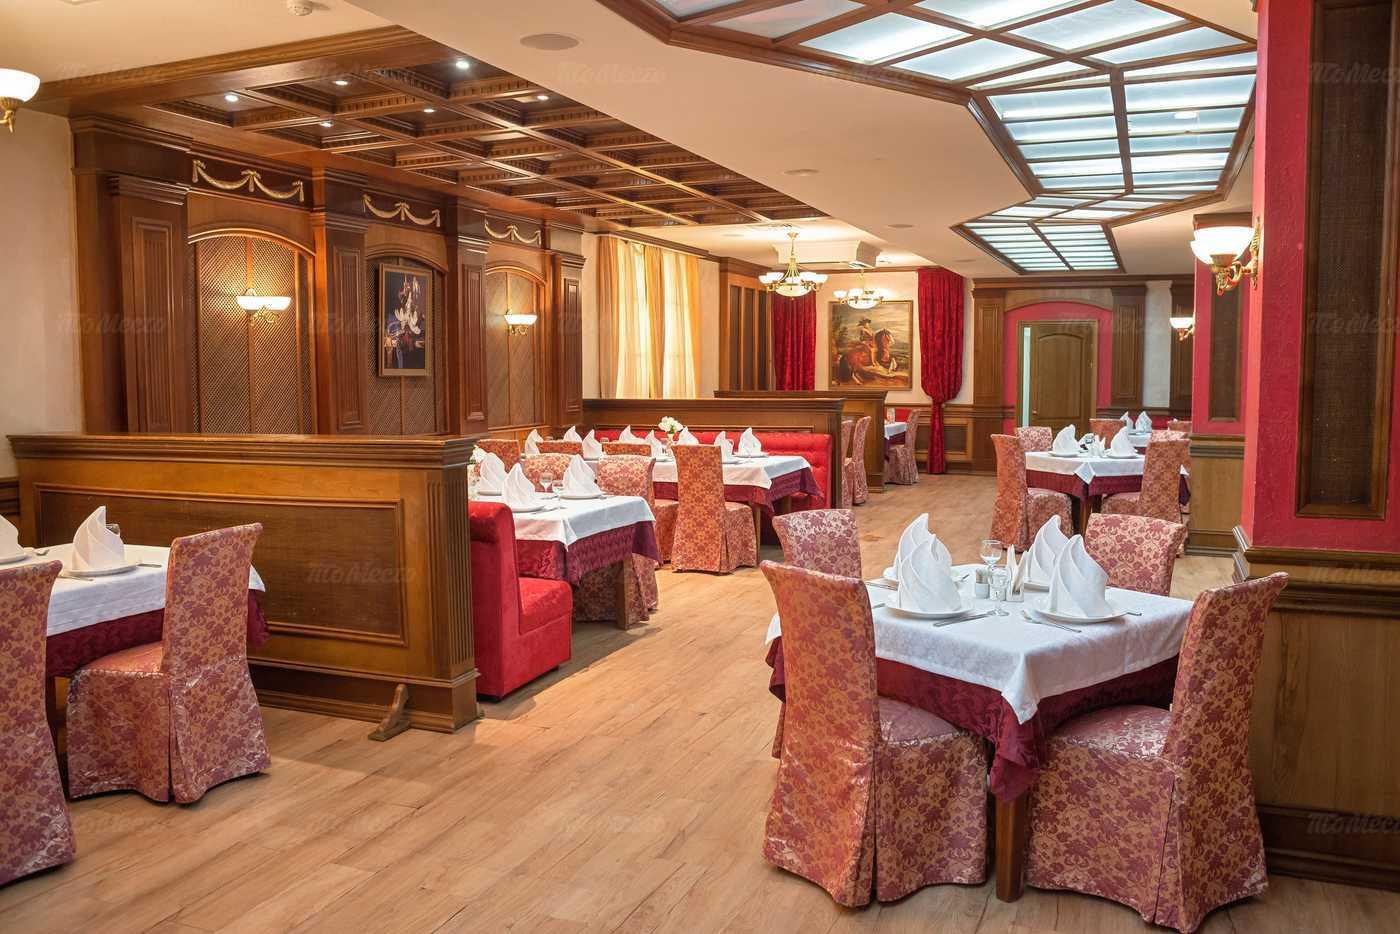 Меню ресторана Царская охота на проспекте Дзержинского